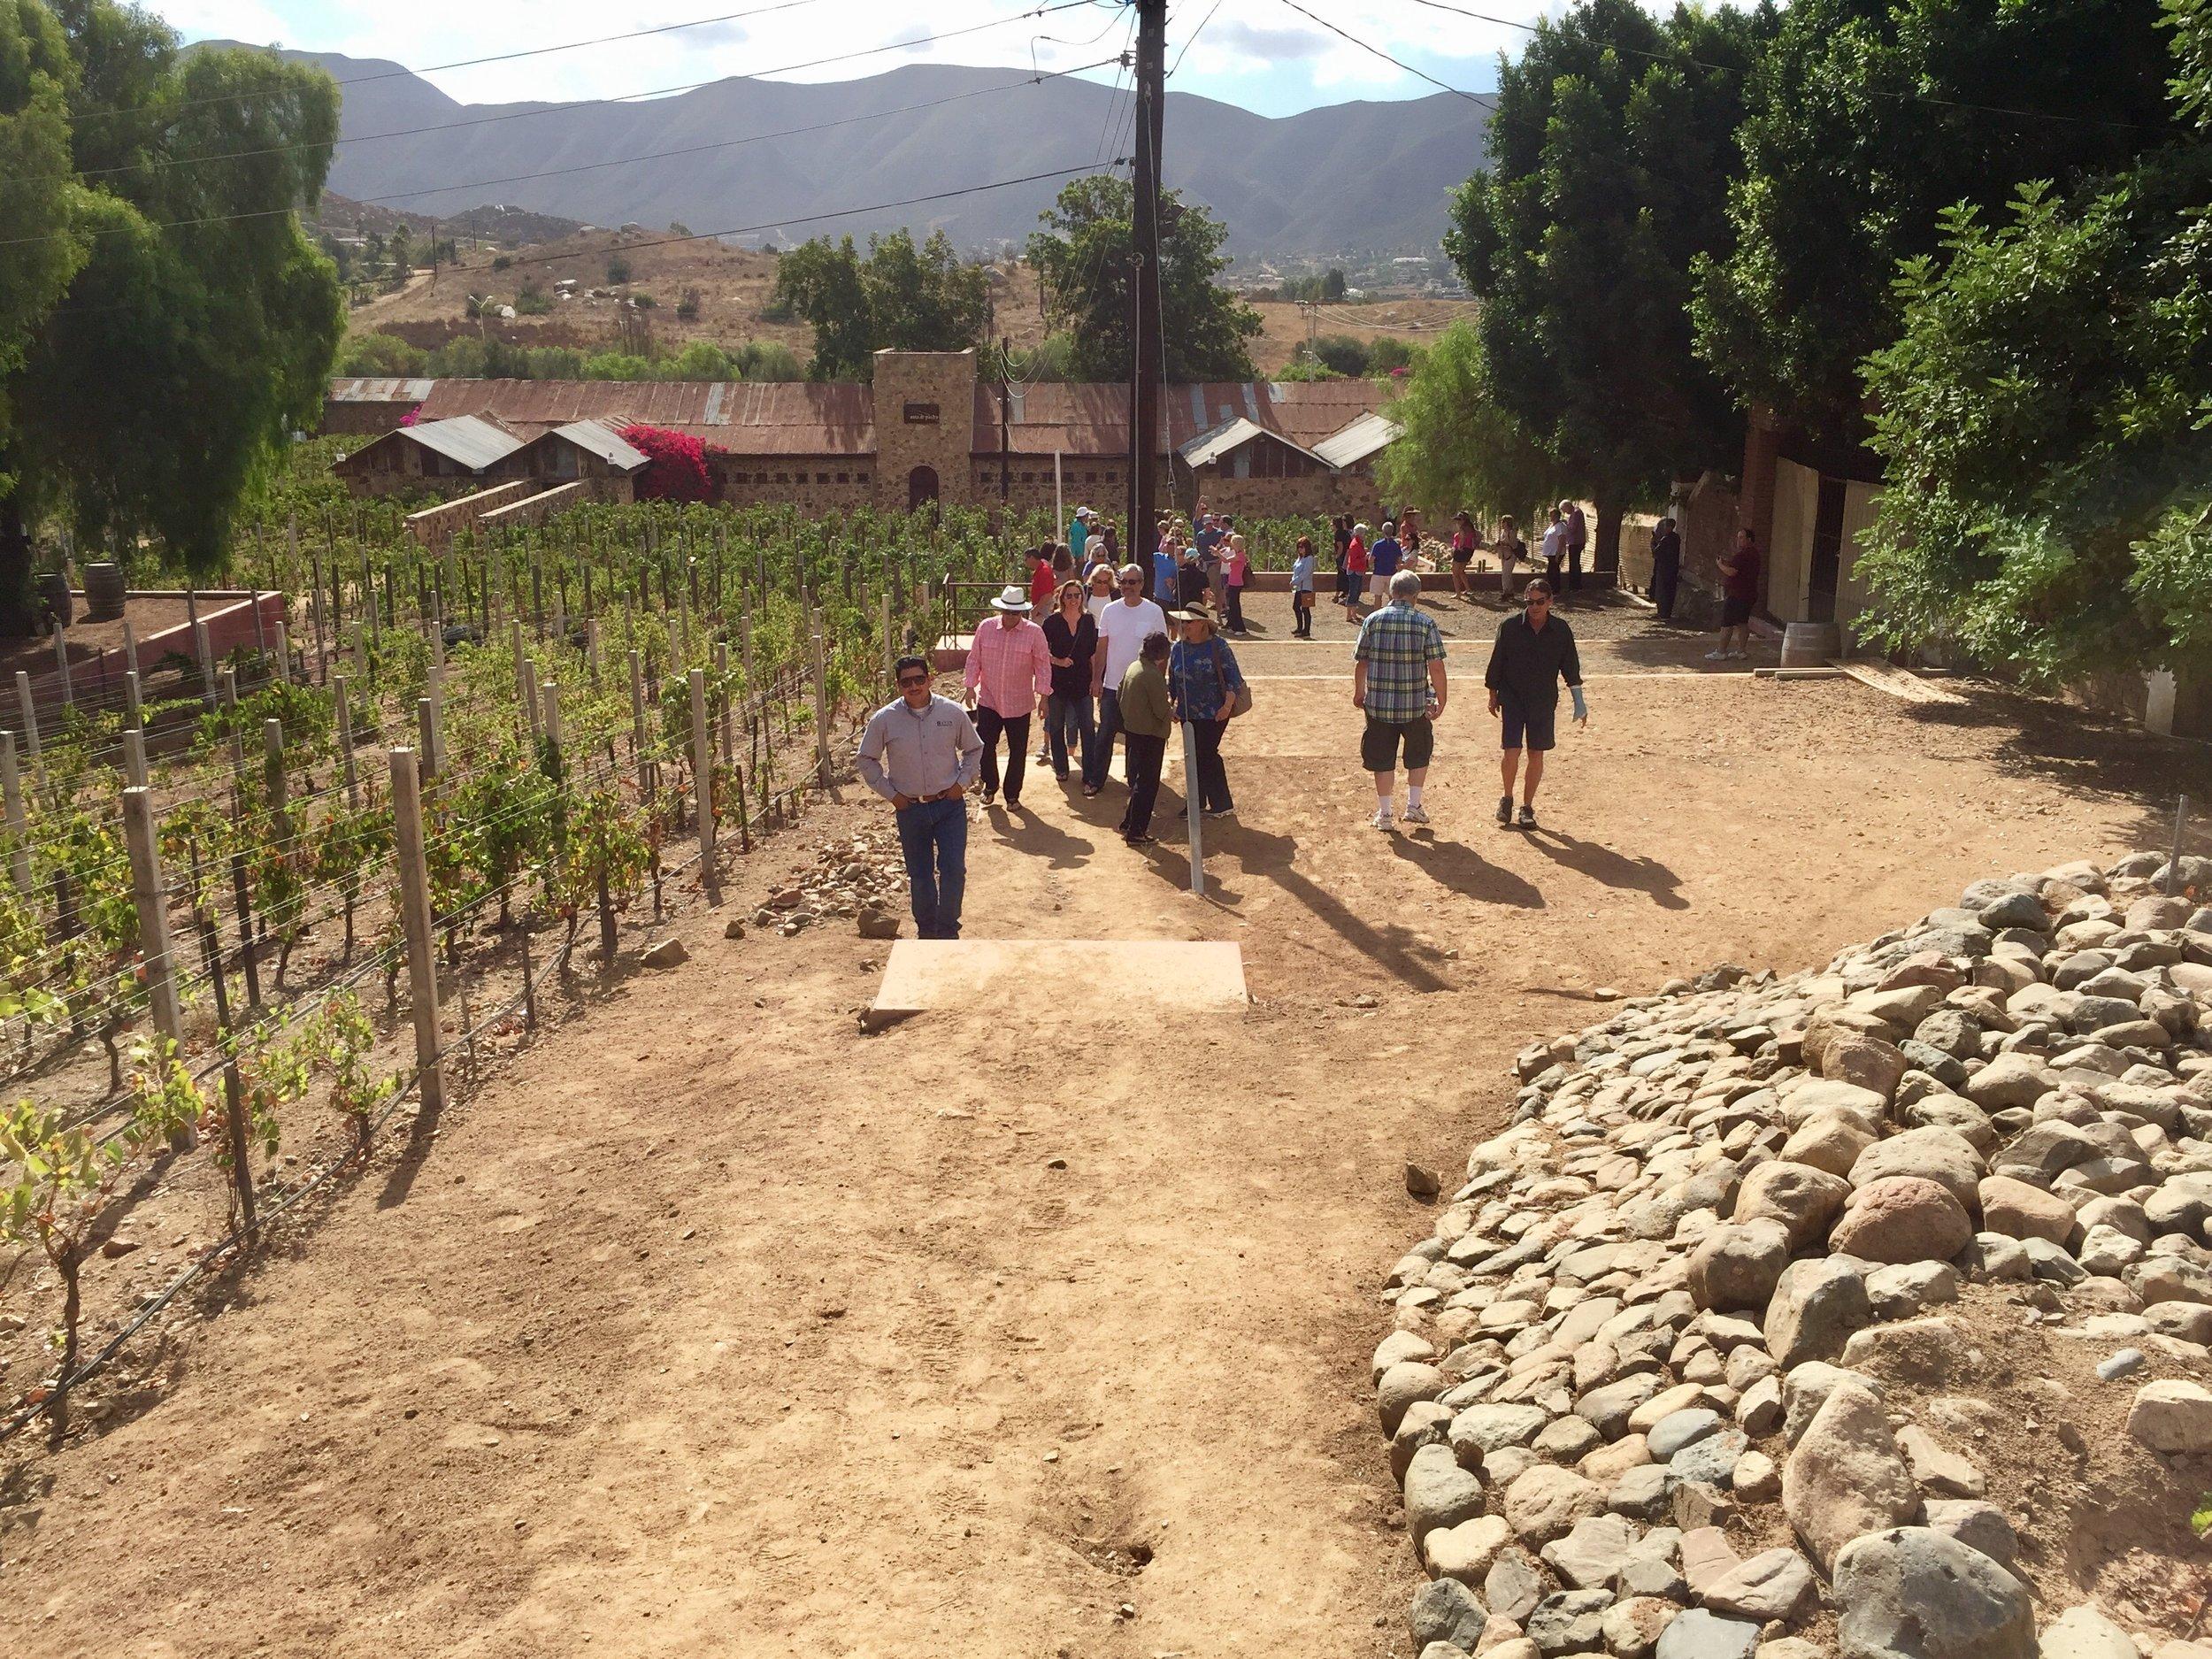 Vineyard trek through the Chardonnay vines at Casa de Piedra with Abimael